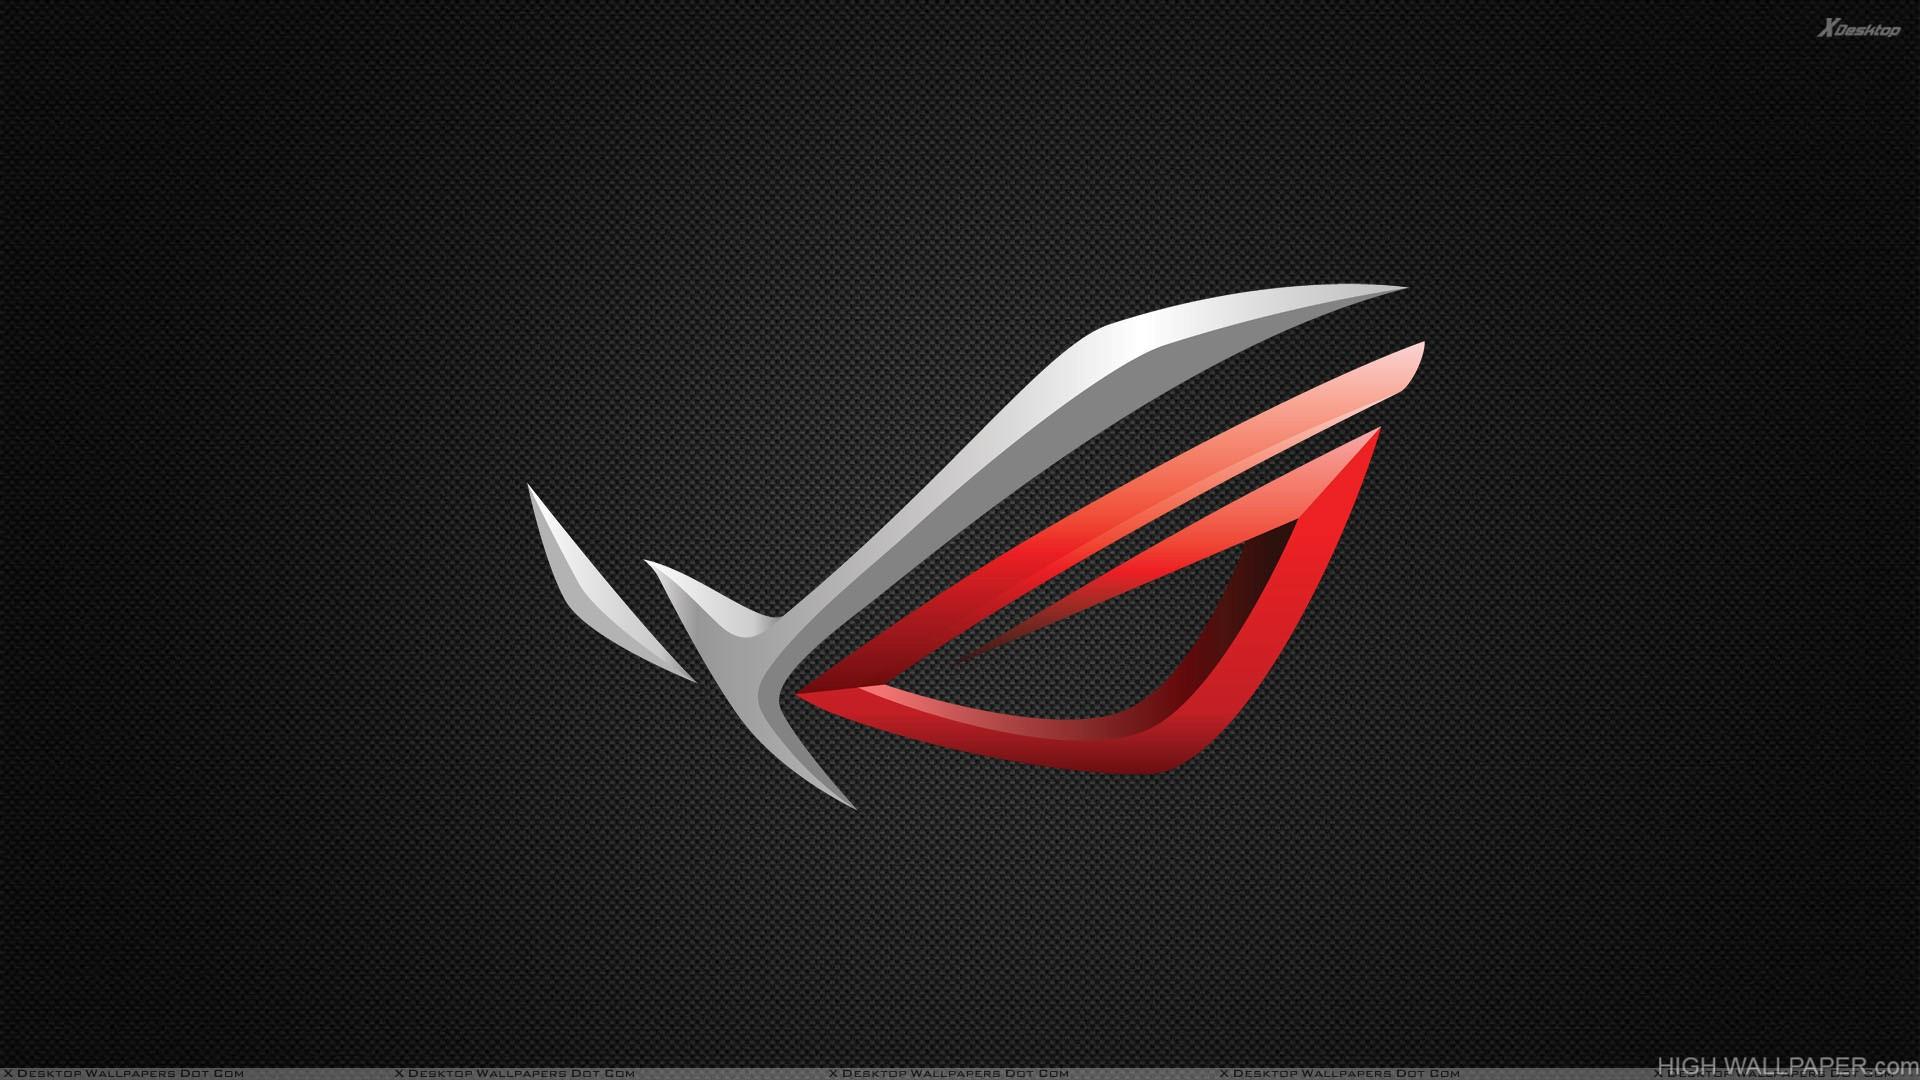 Asus ROG Logo On Black Background HD Wallpaper